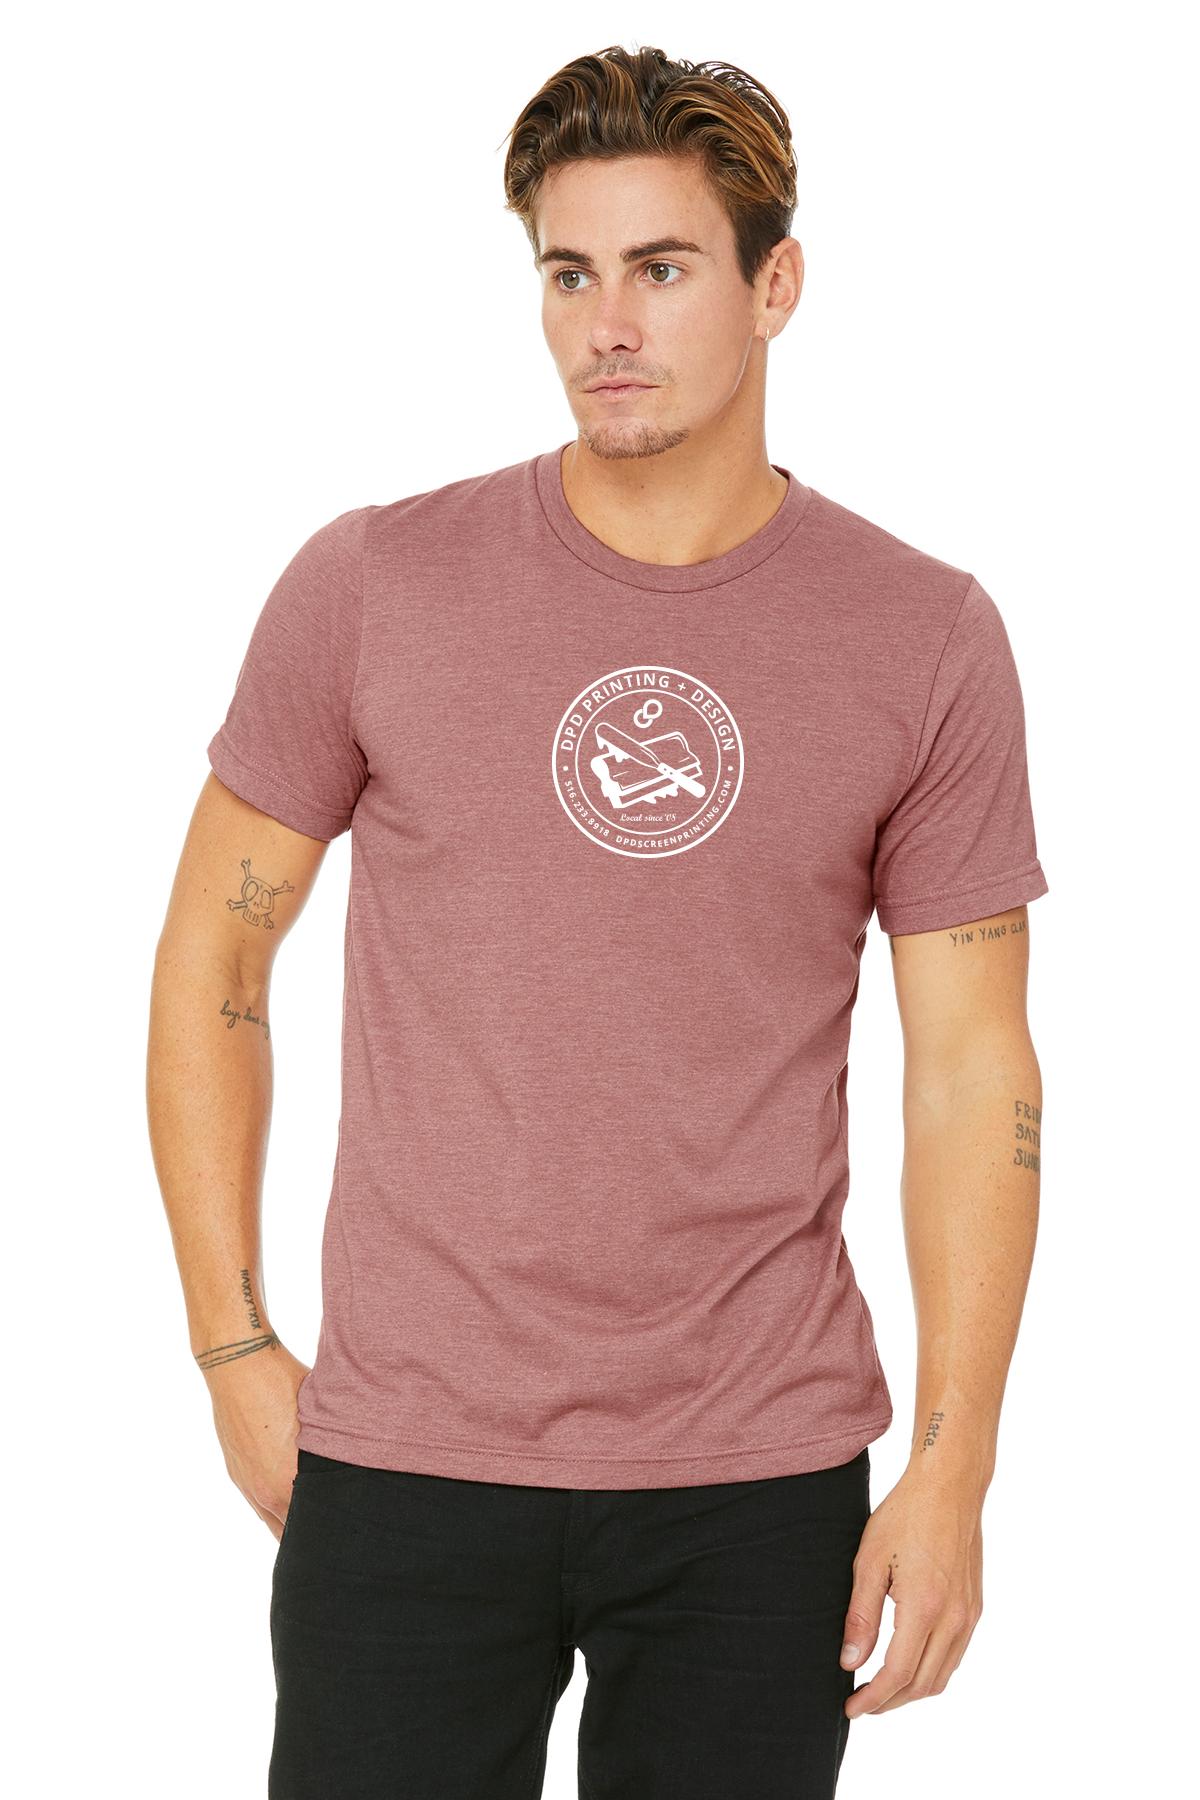 T-shirts - Crew Necks, V-necks, Long Sleeve